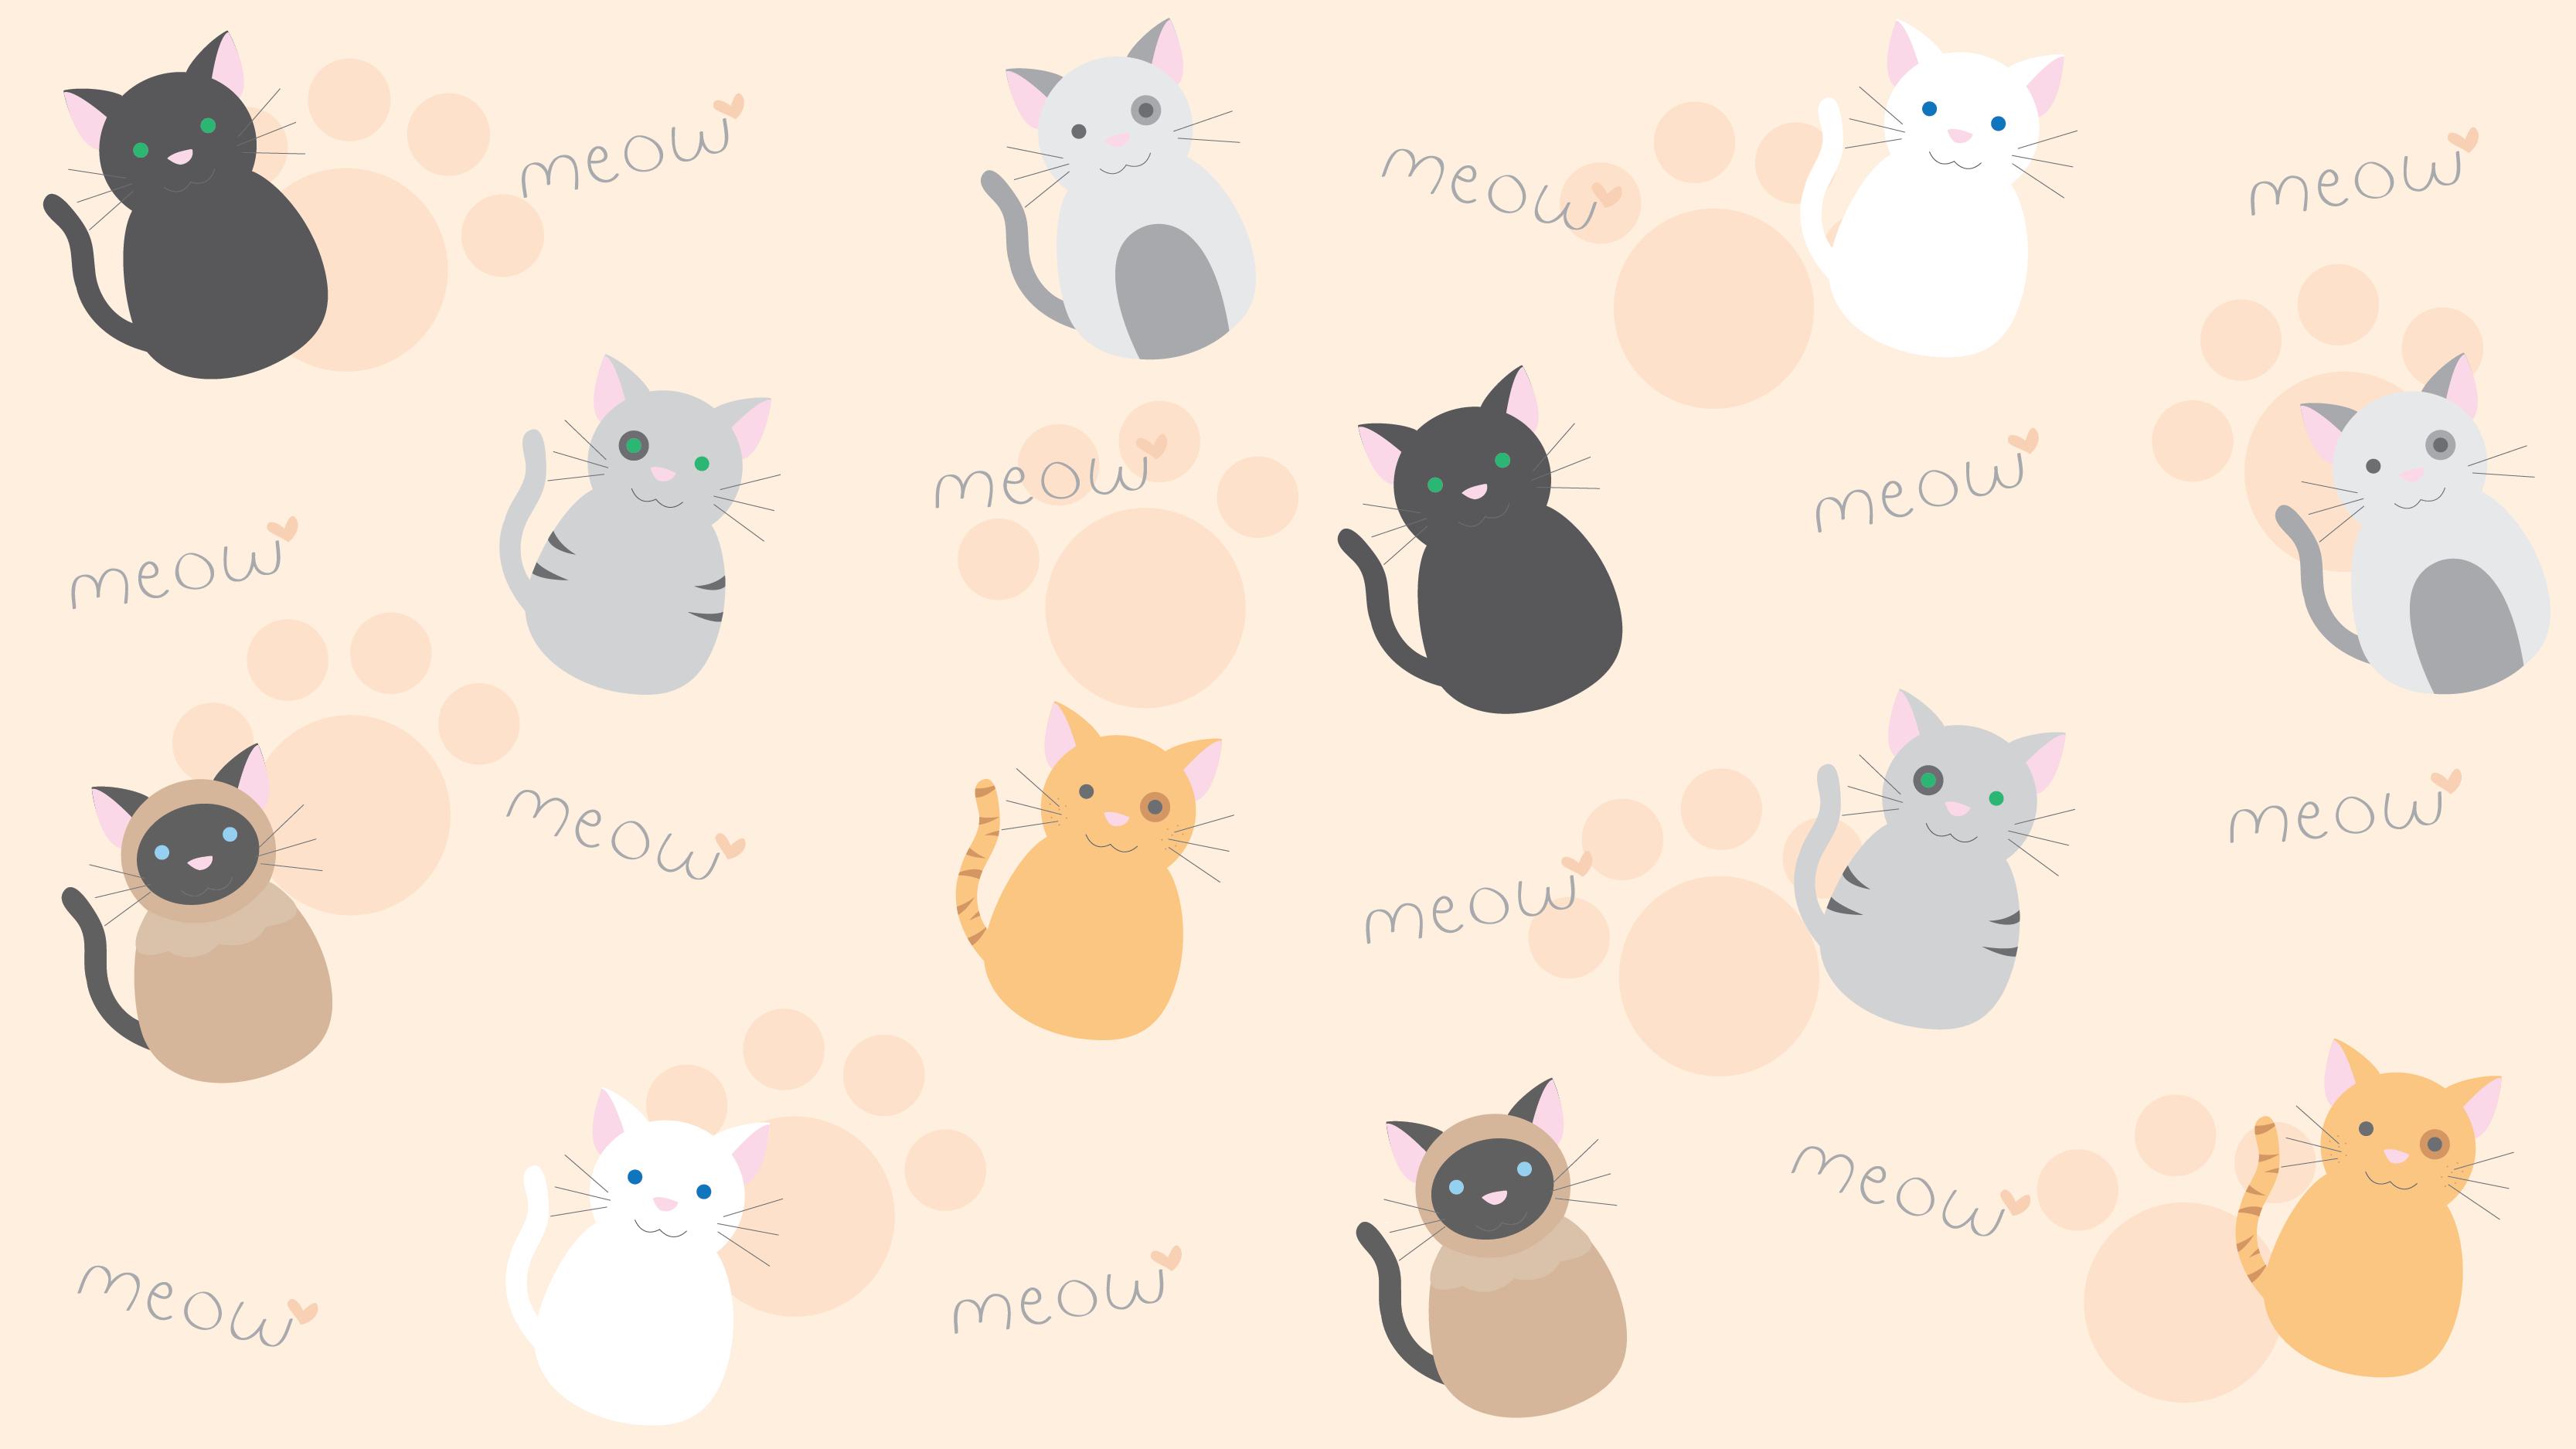 kawaii kitty wallpaper by technicolorblackout deviantart com on deviantart